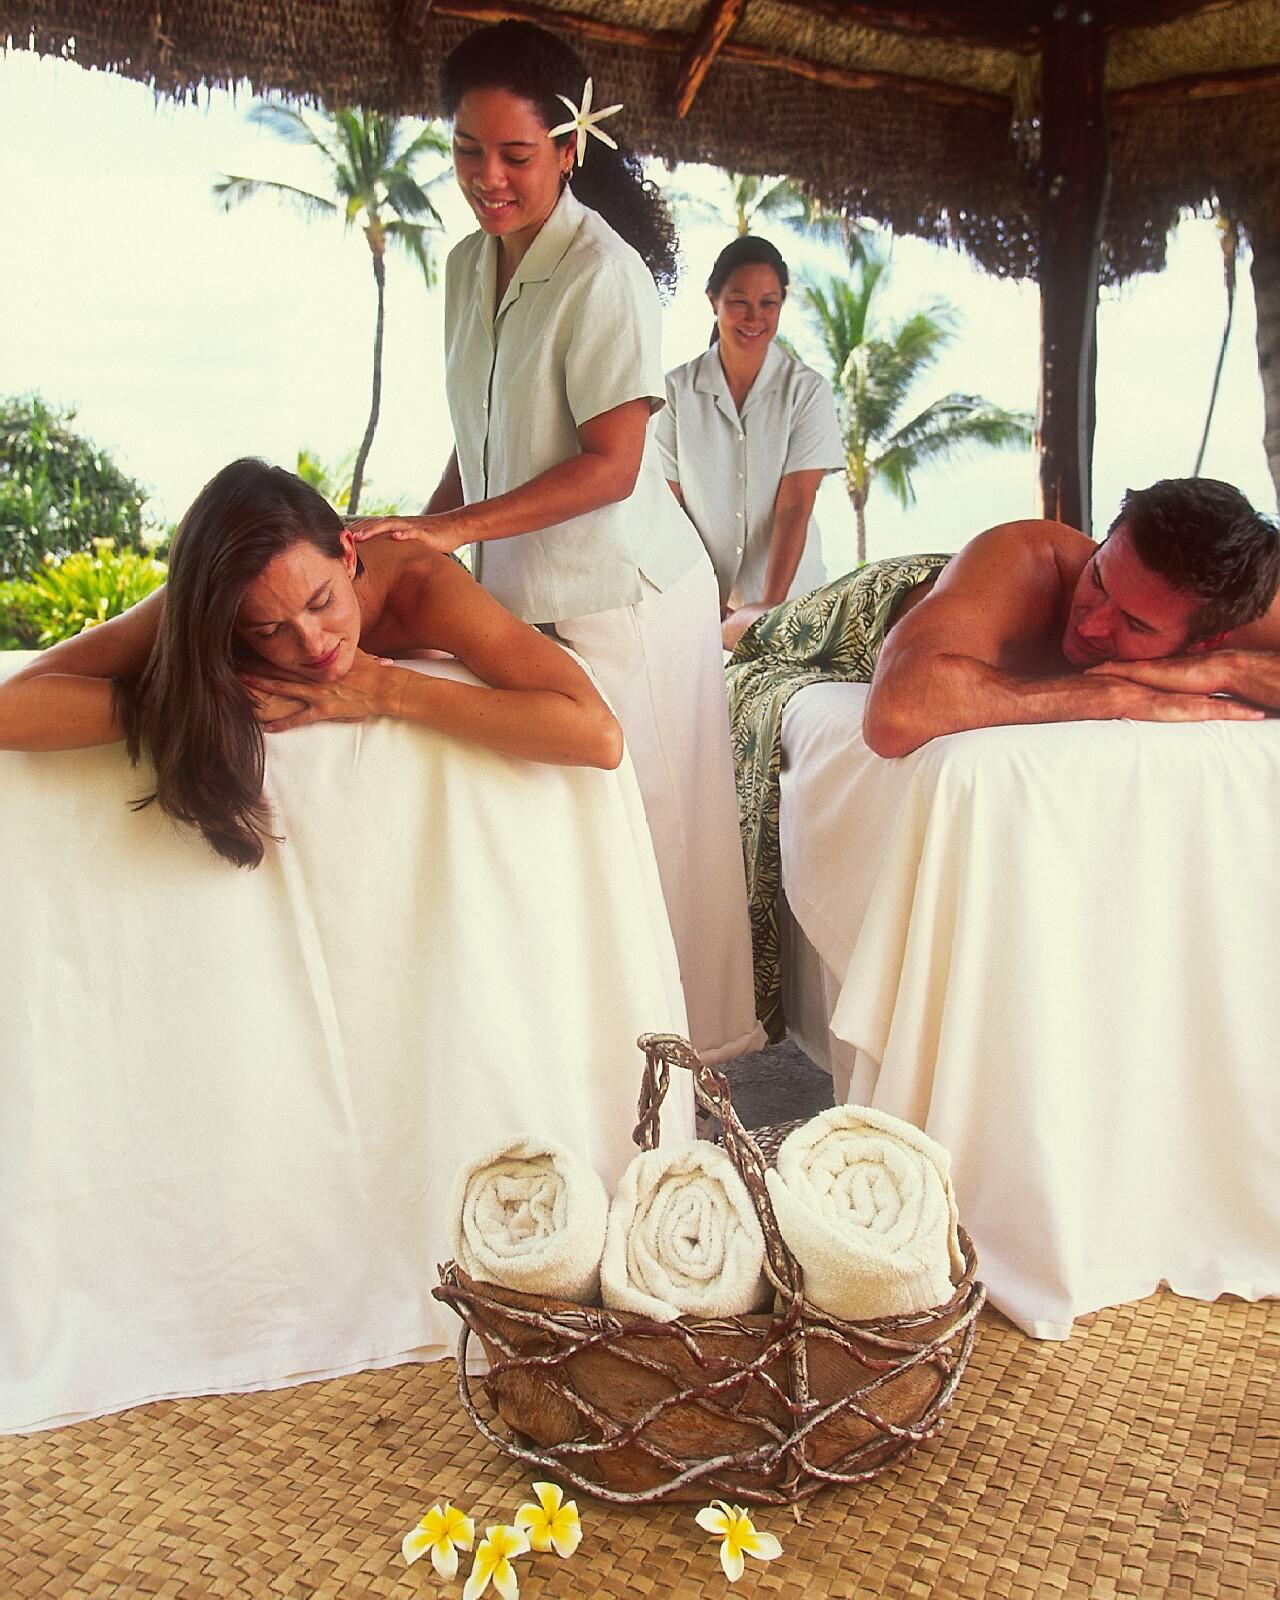 Whale Season Approaches at Four Seasons Resort Maui at Wailea